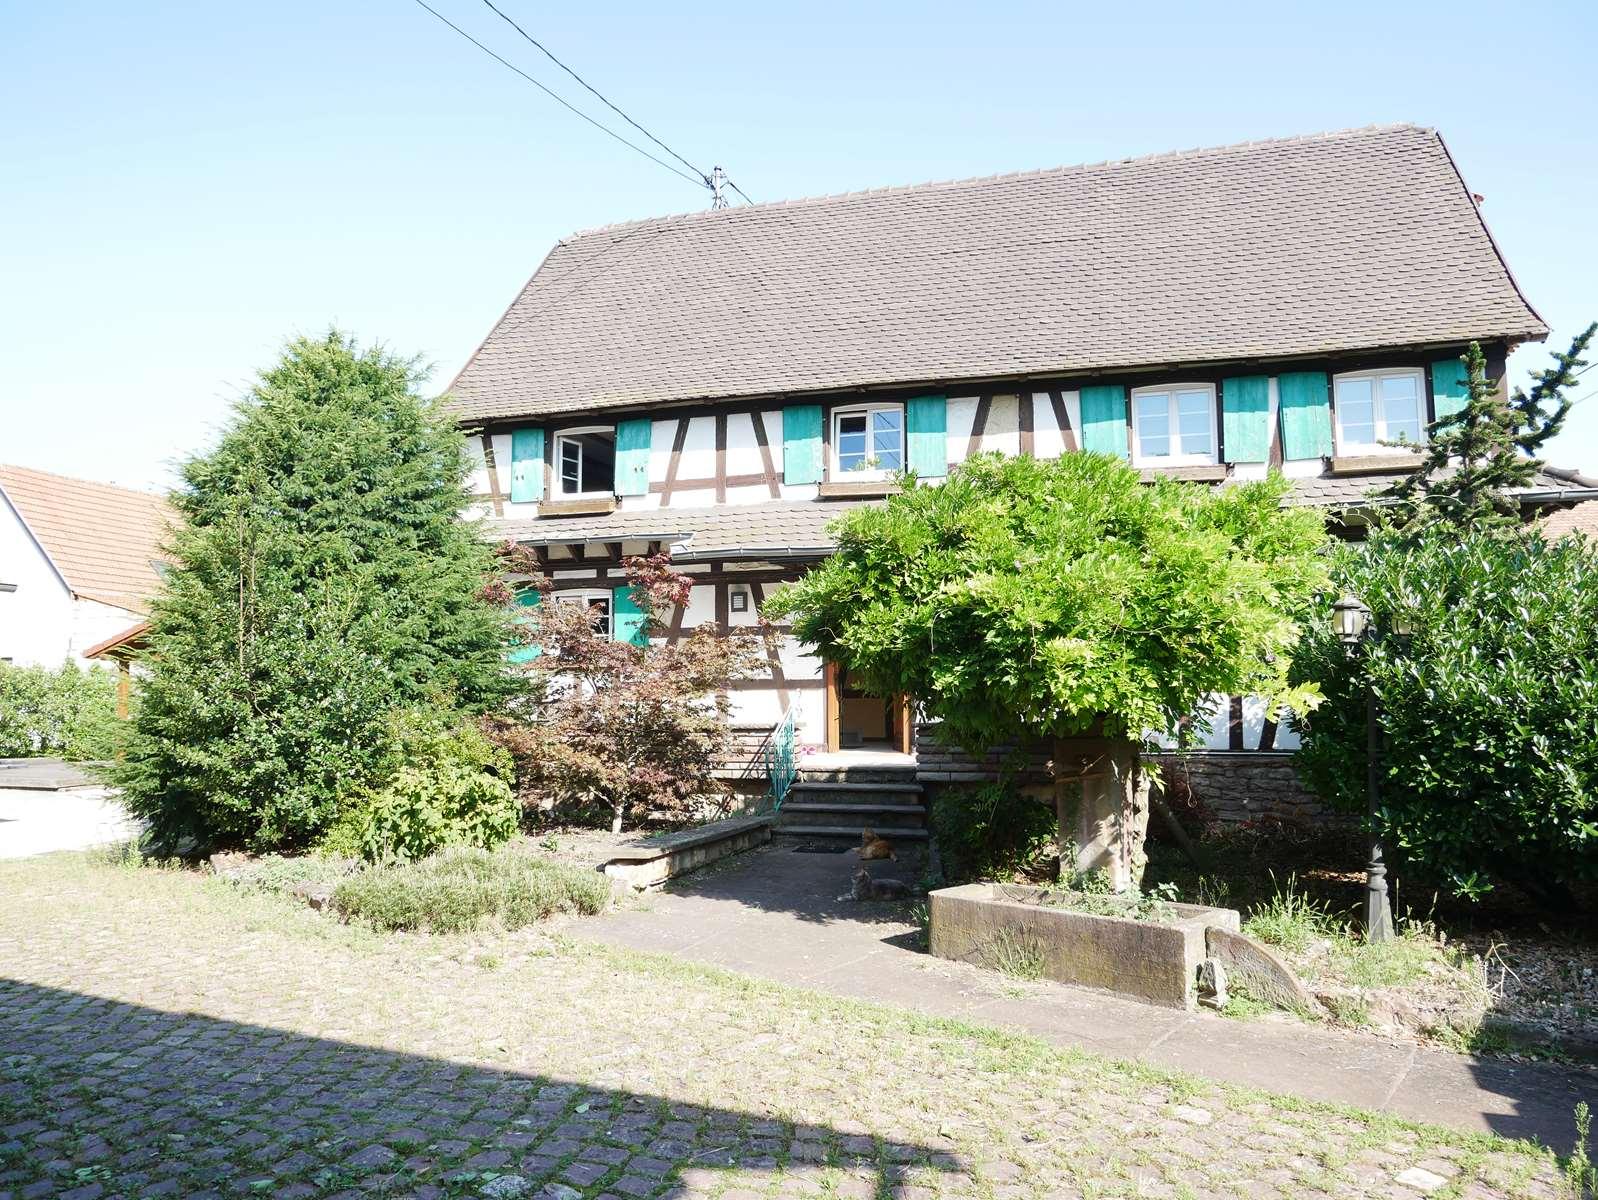 [Colombe] Magnifique maison alsacienne à Illkirch-Graffenstaden - nos ventes - Beausite Immobilier 1